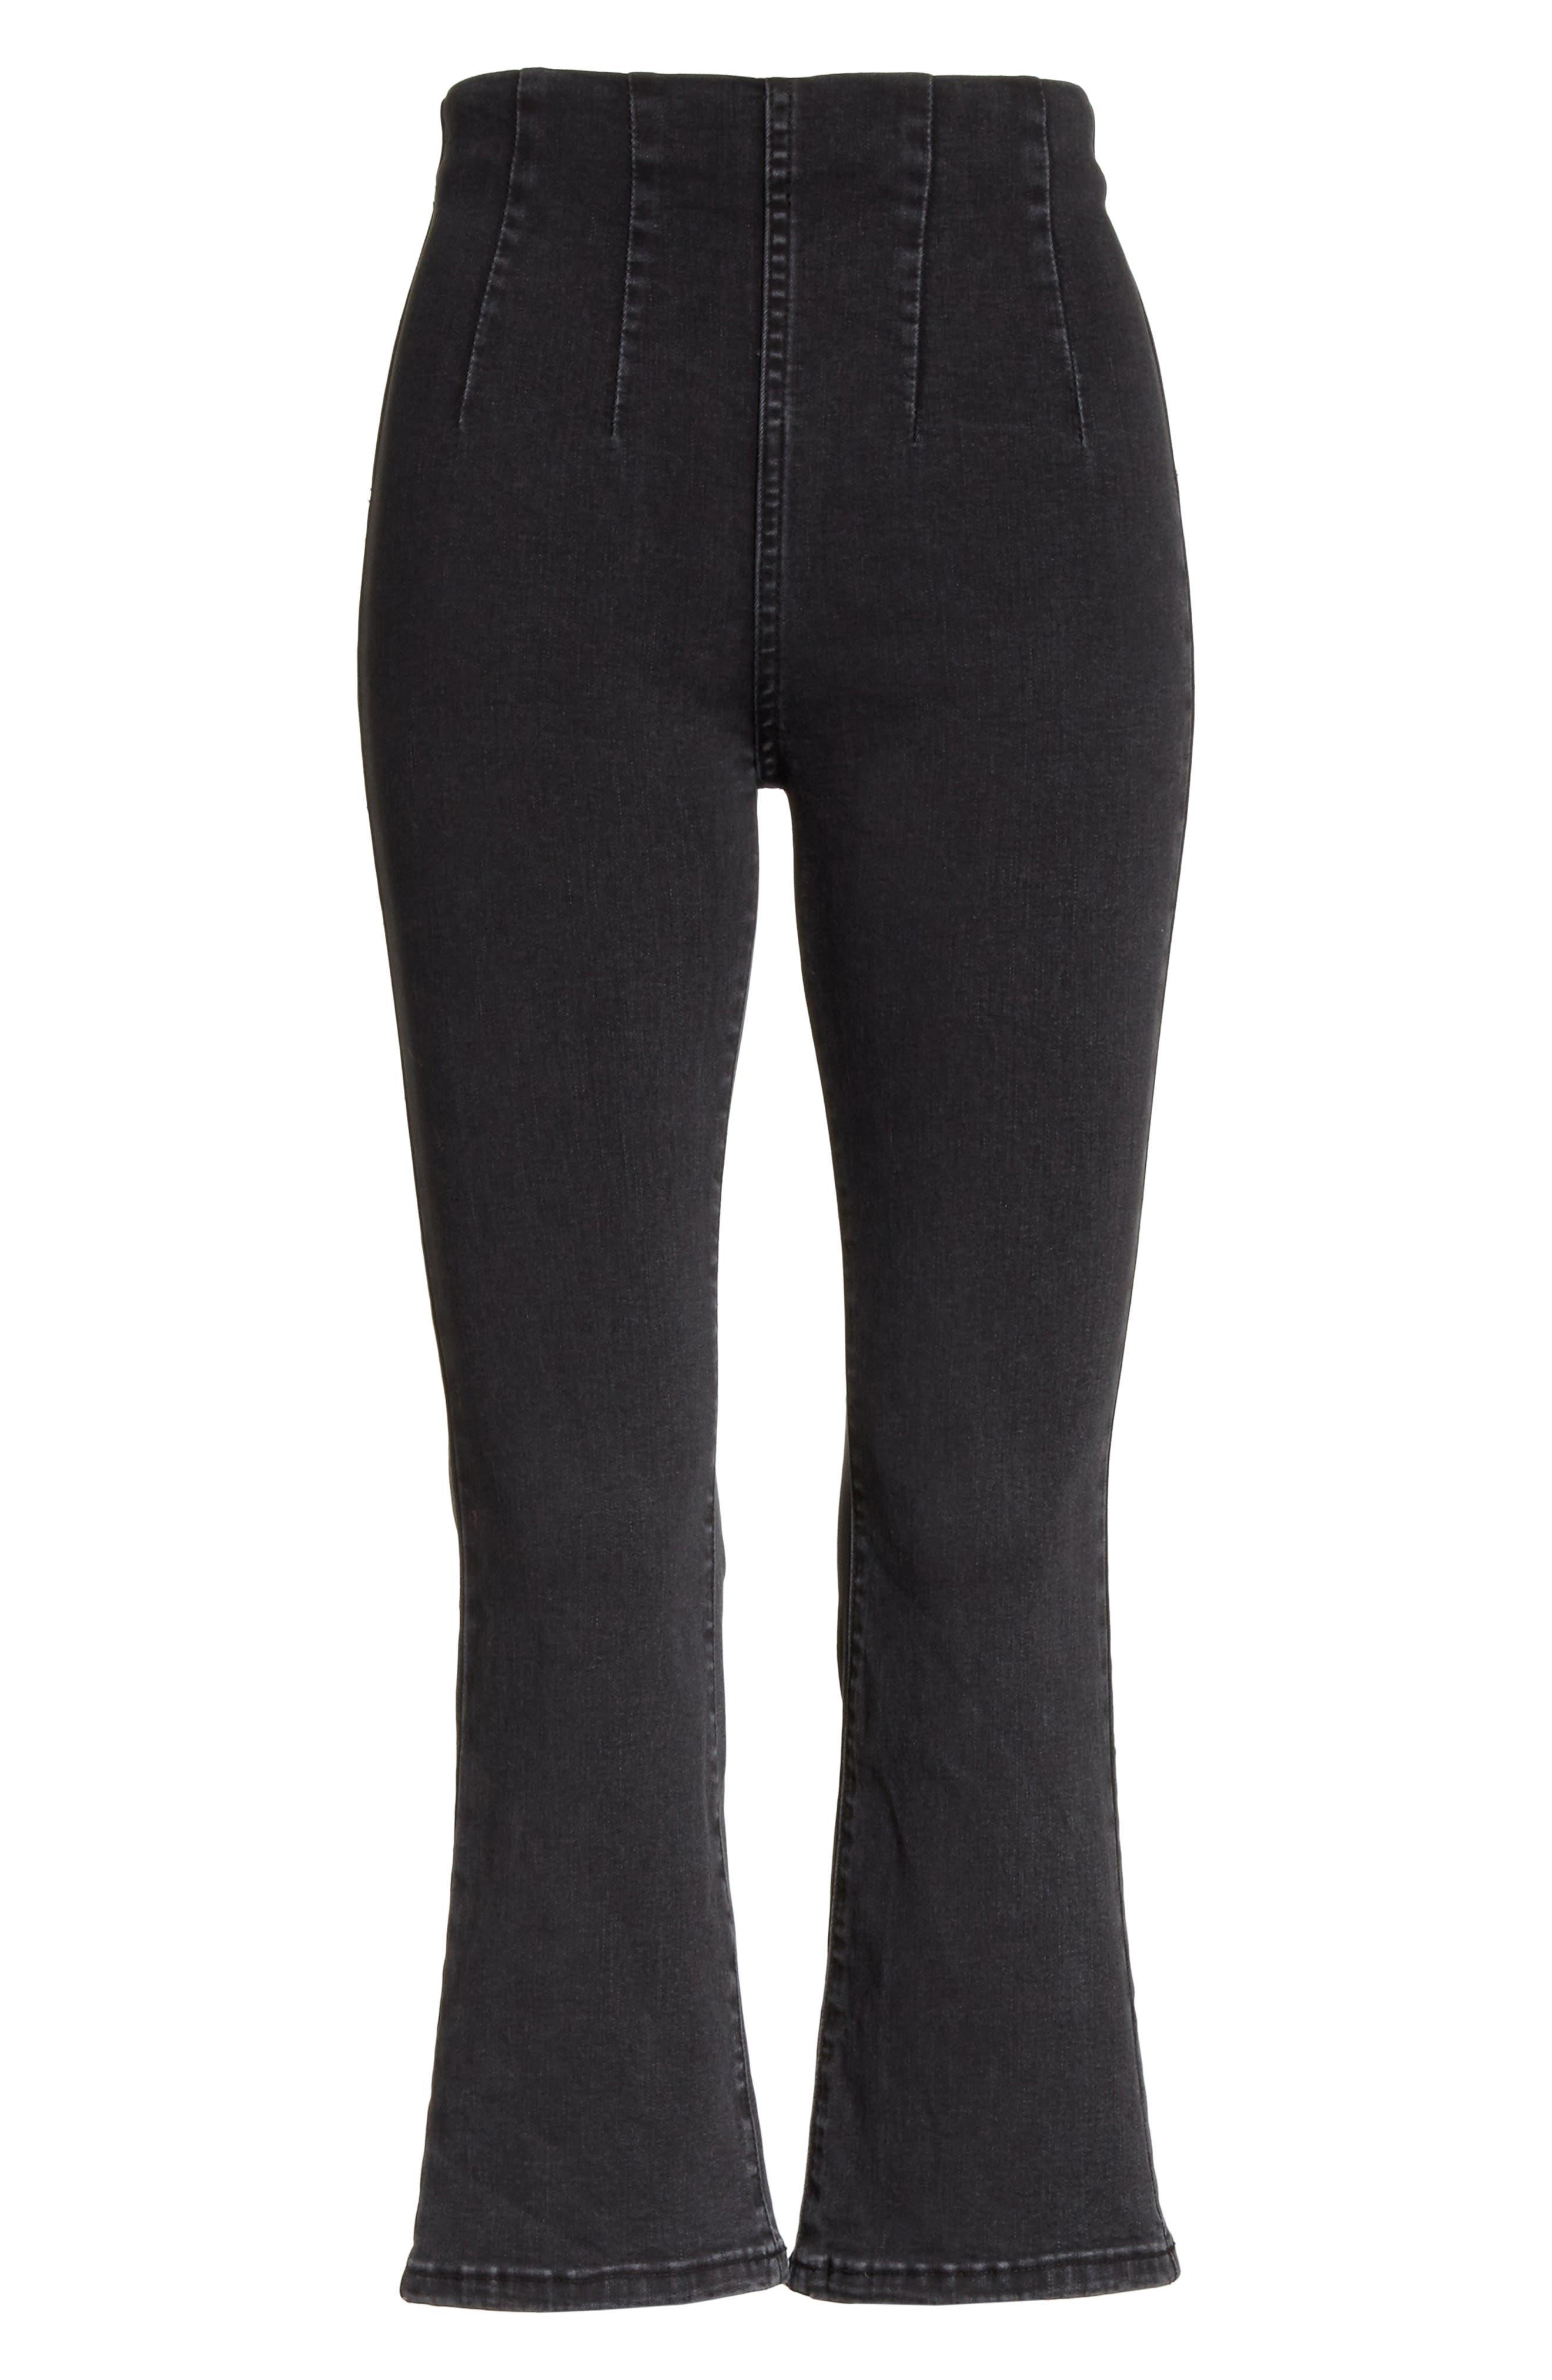 Ultra High Waist Crop Bootcut Jeans,                             Alternate thumbnail 7, color,                             Black